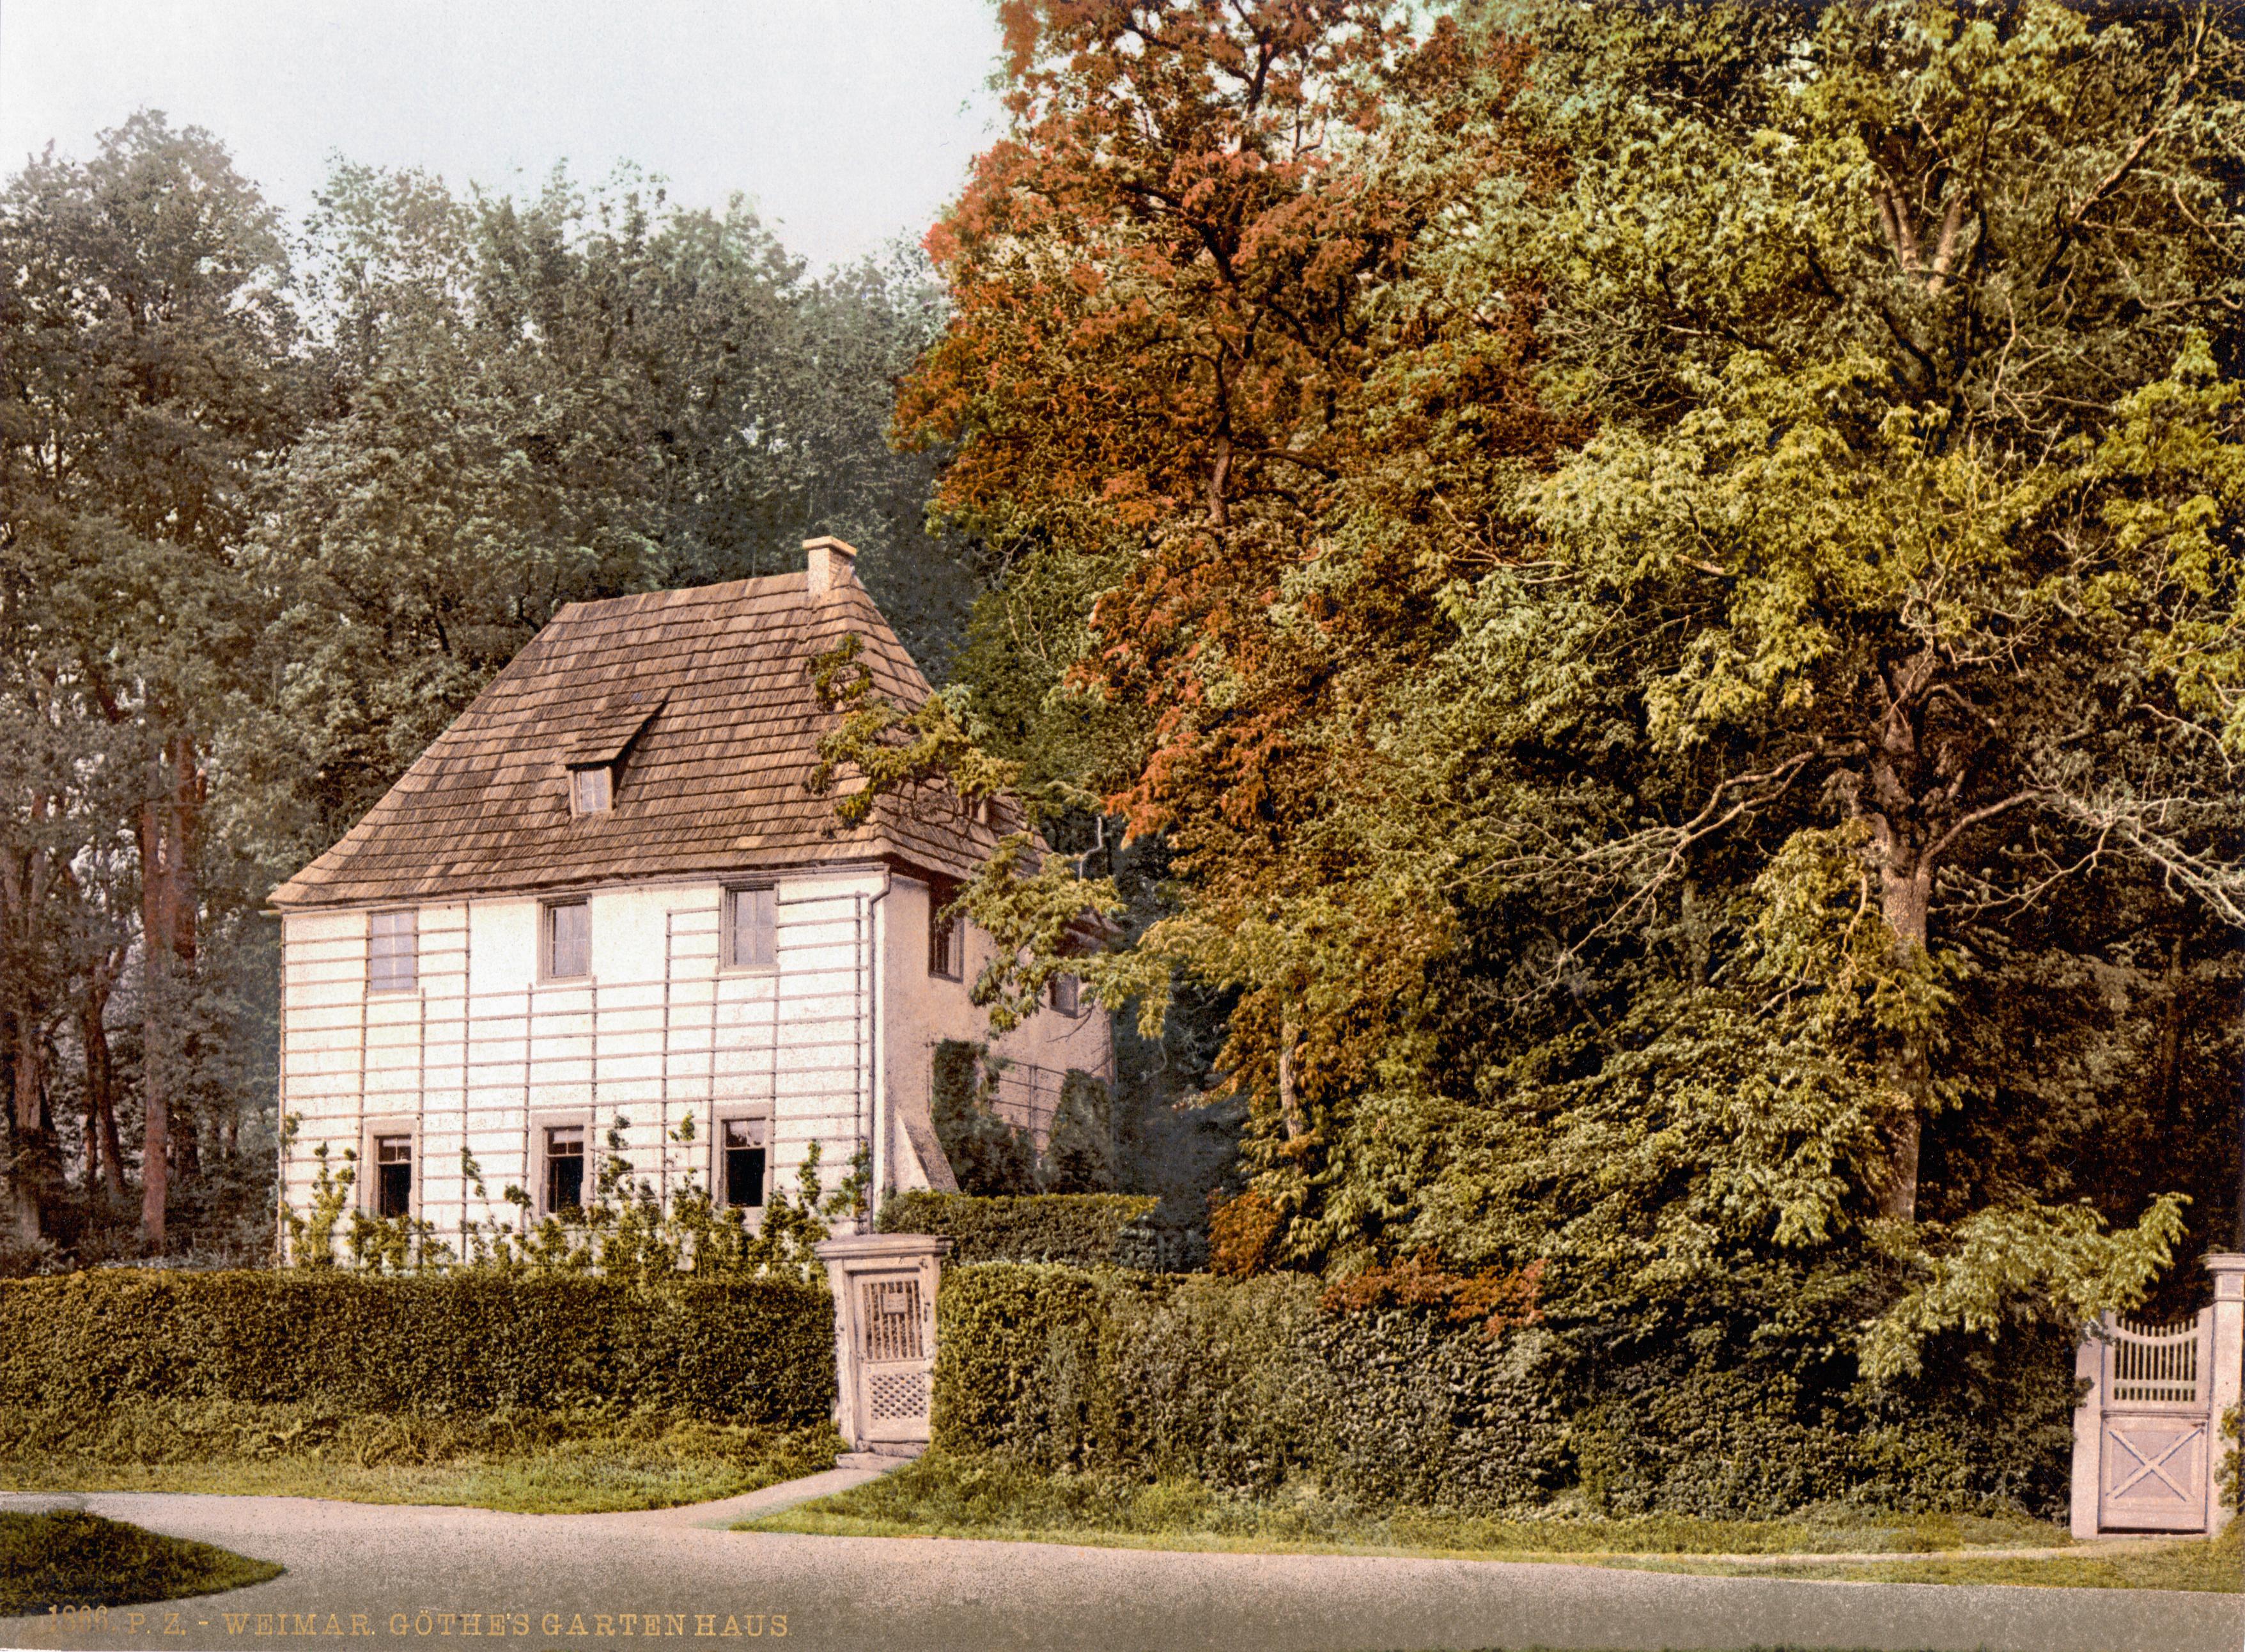 file weimar goethe gartenhaus wikimedia commons. Black Bedroom Furniture Sets. Home Design Ideas